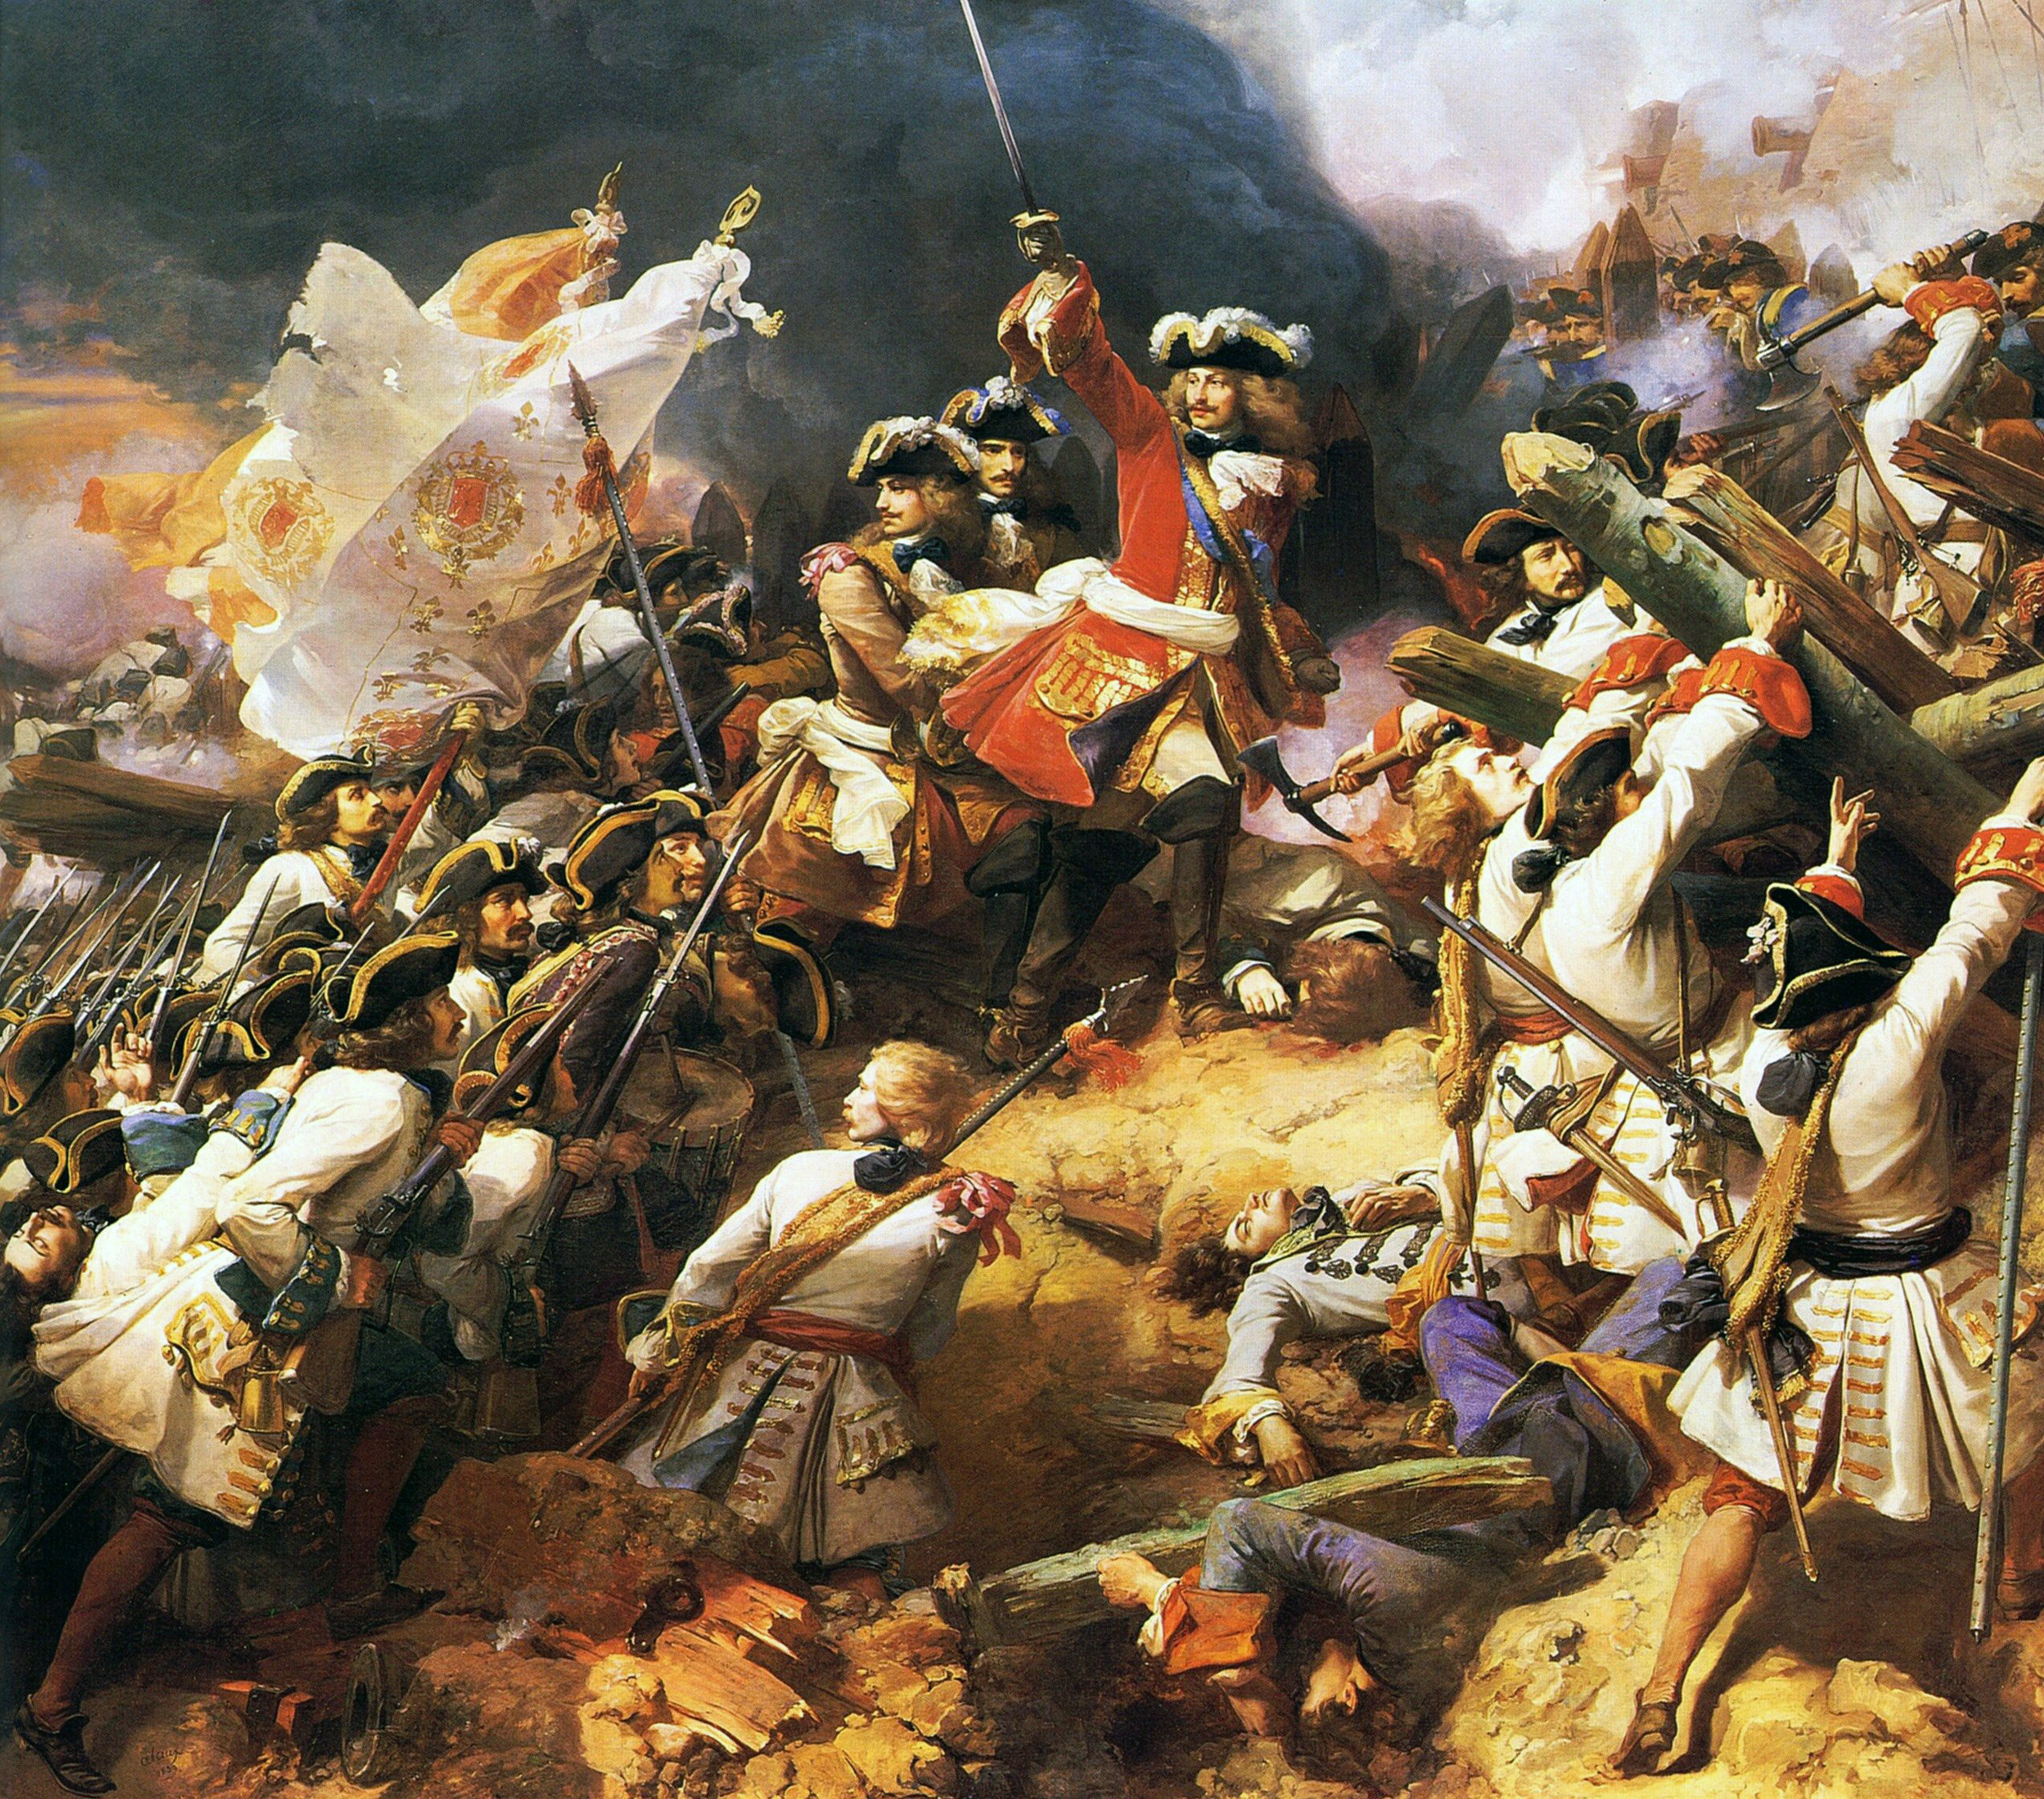 Battle of Denain. (1712). Painting by Jean Alo.